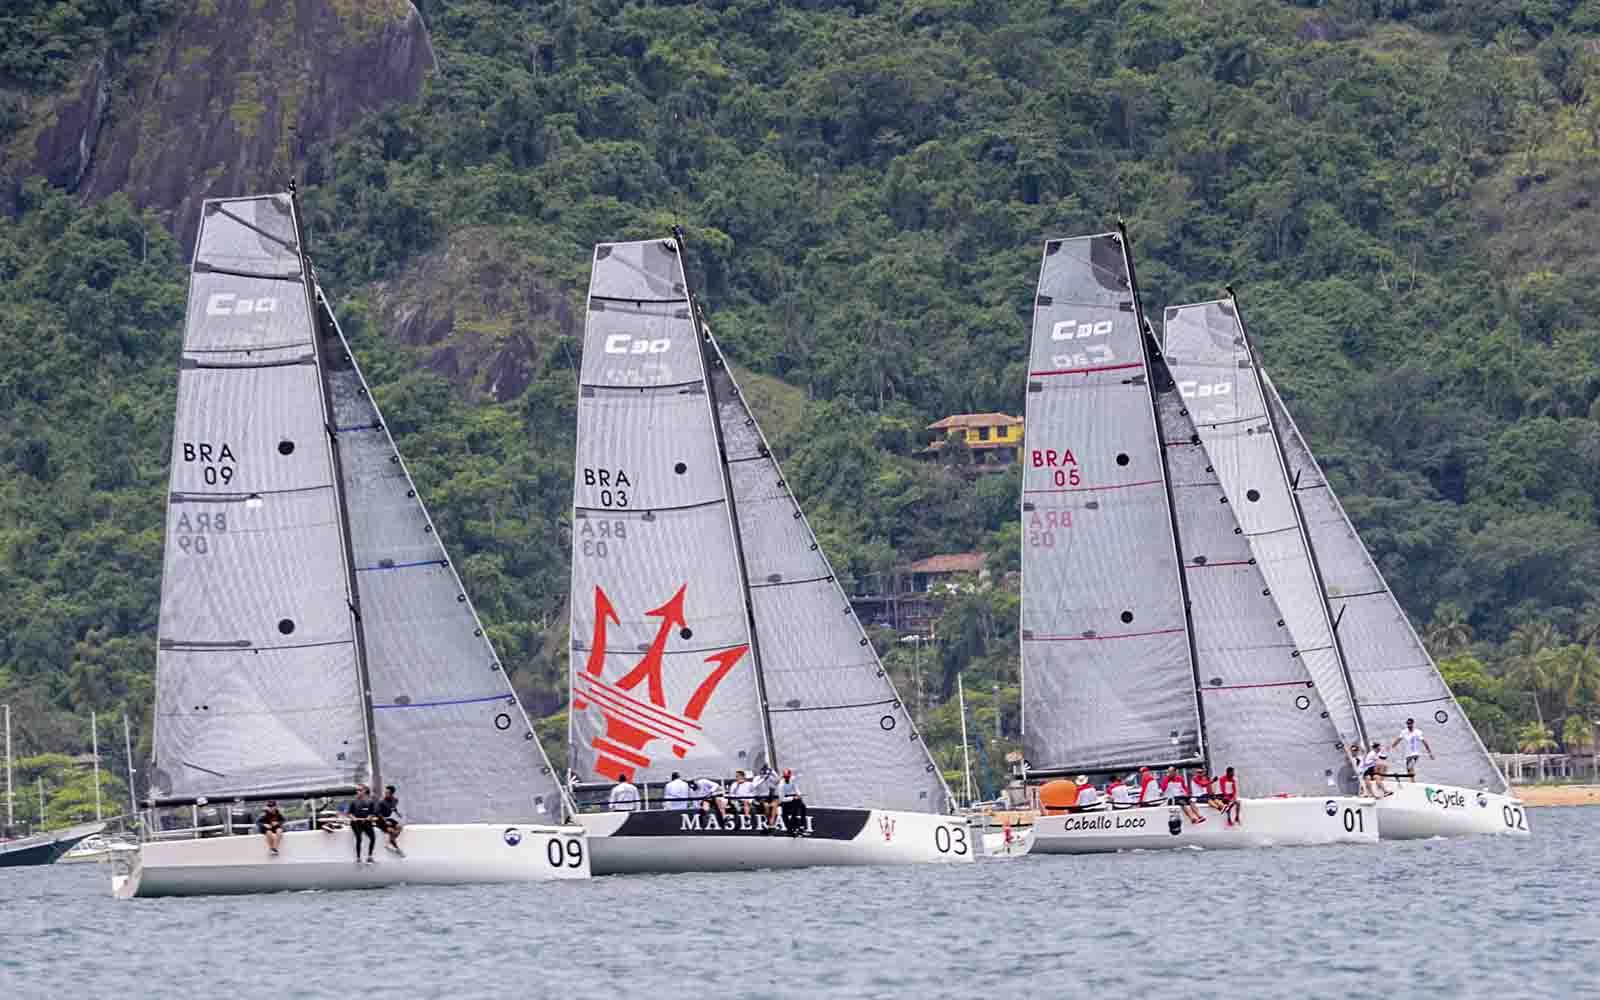 Flotilha de C30 (Aline Bassi Balaio de Ideias) - boat shopping